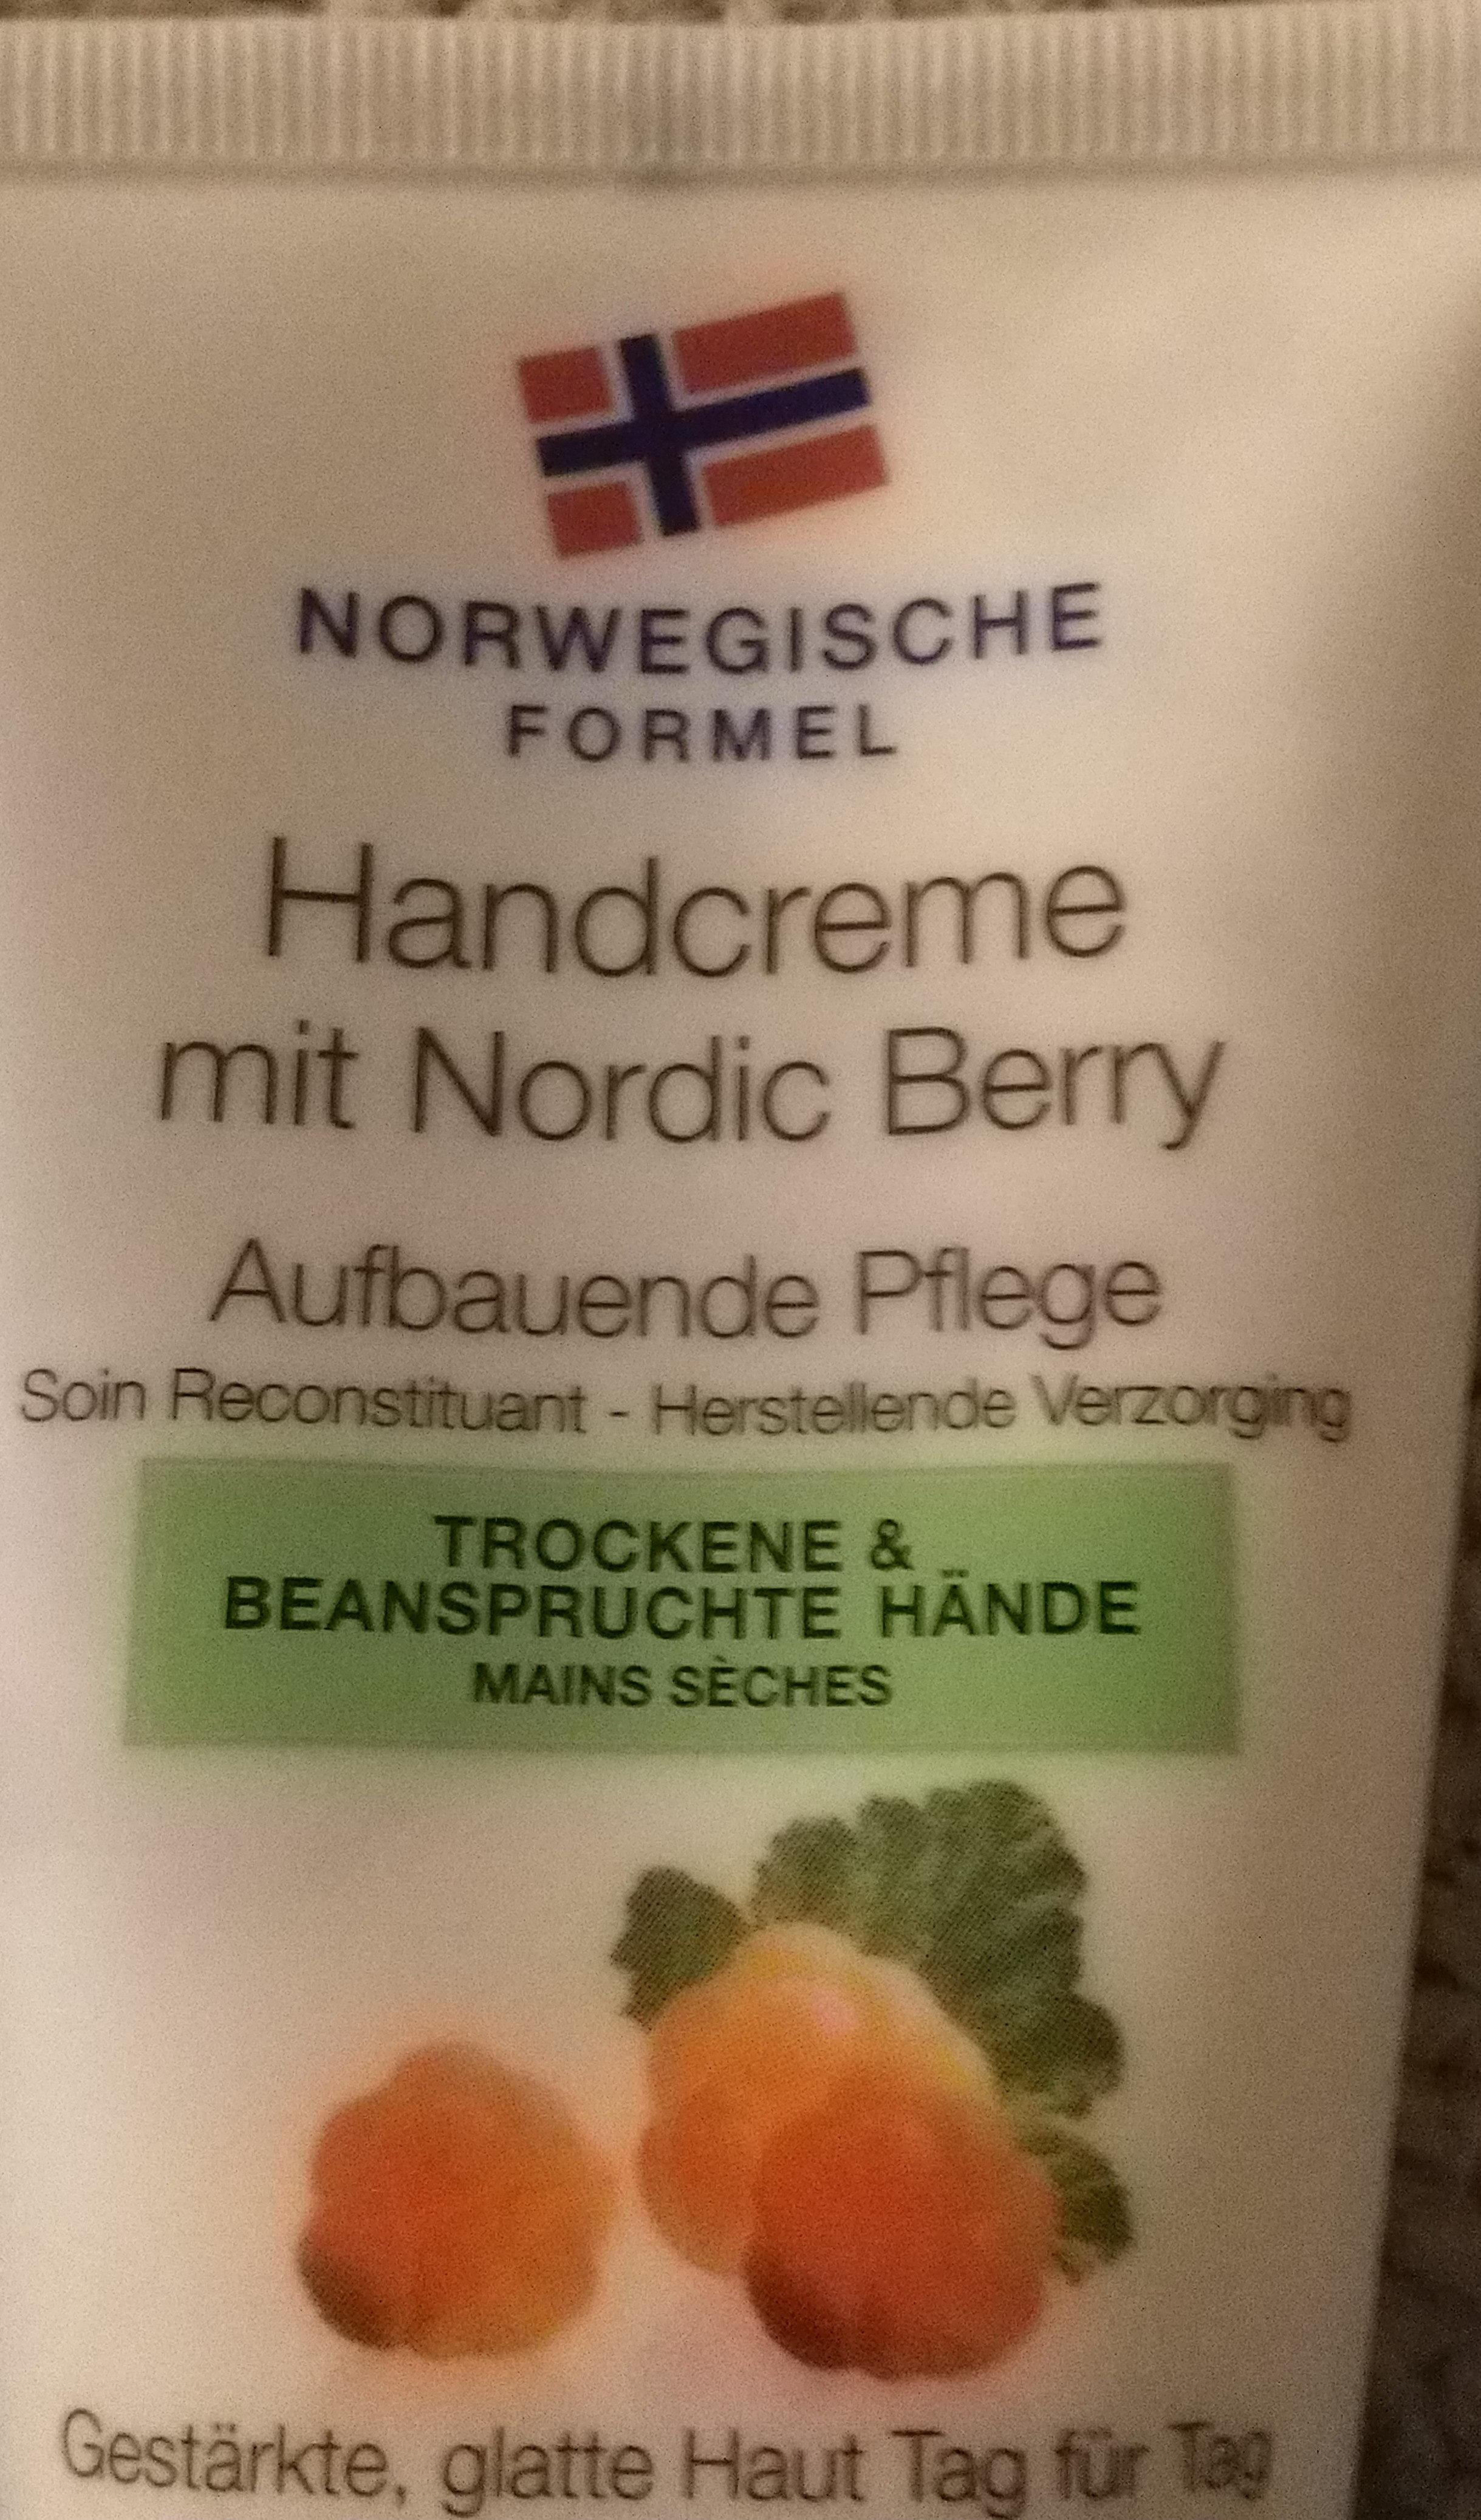 Handcrem mit Nordic Berry - Product - de